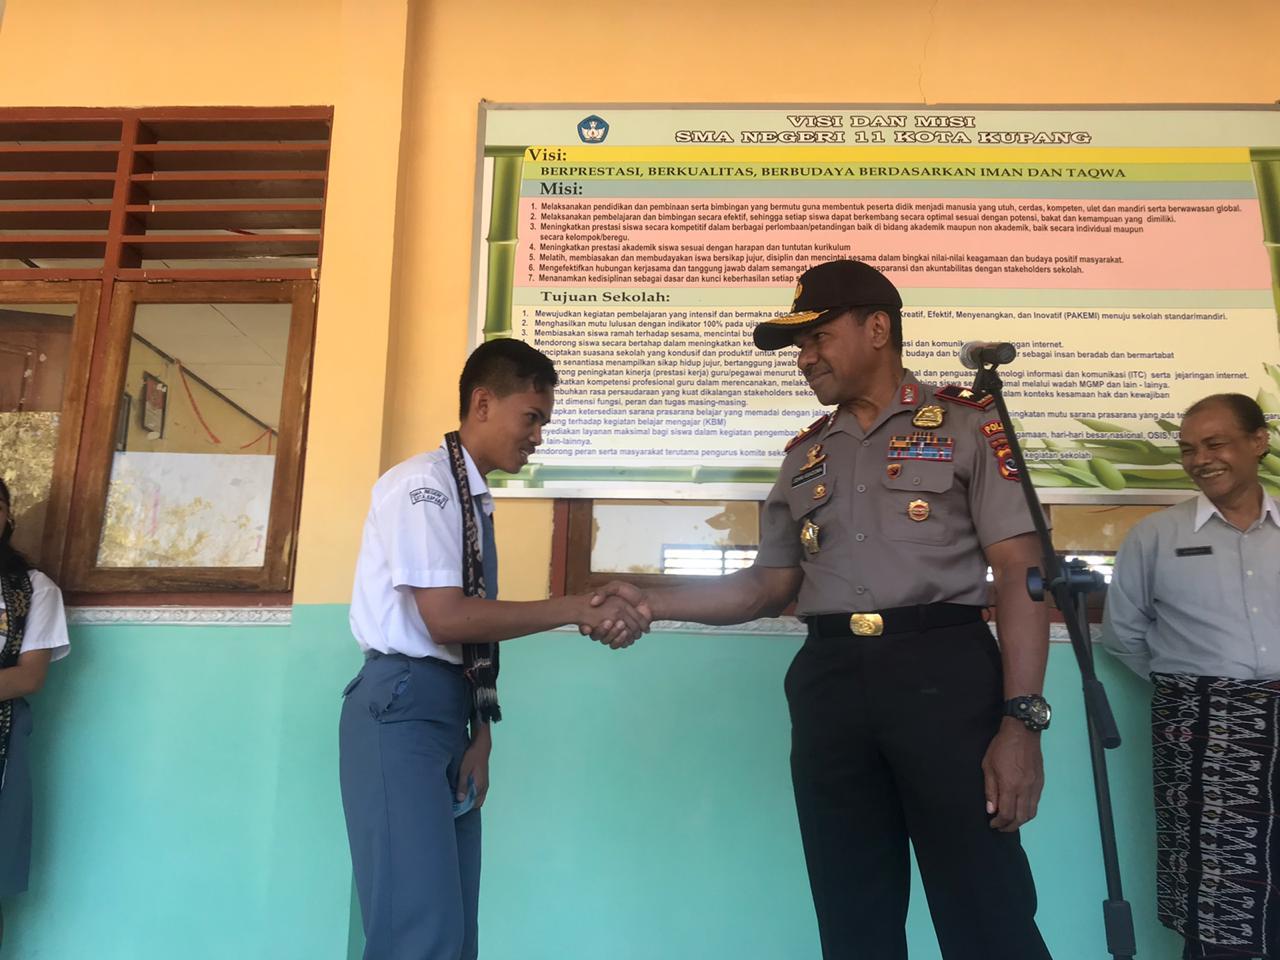 Wakapolda NTT Lakukan Safari Kamtibmas di SMA 11 Kota Kupang